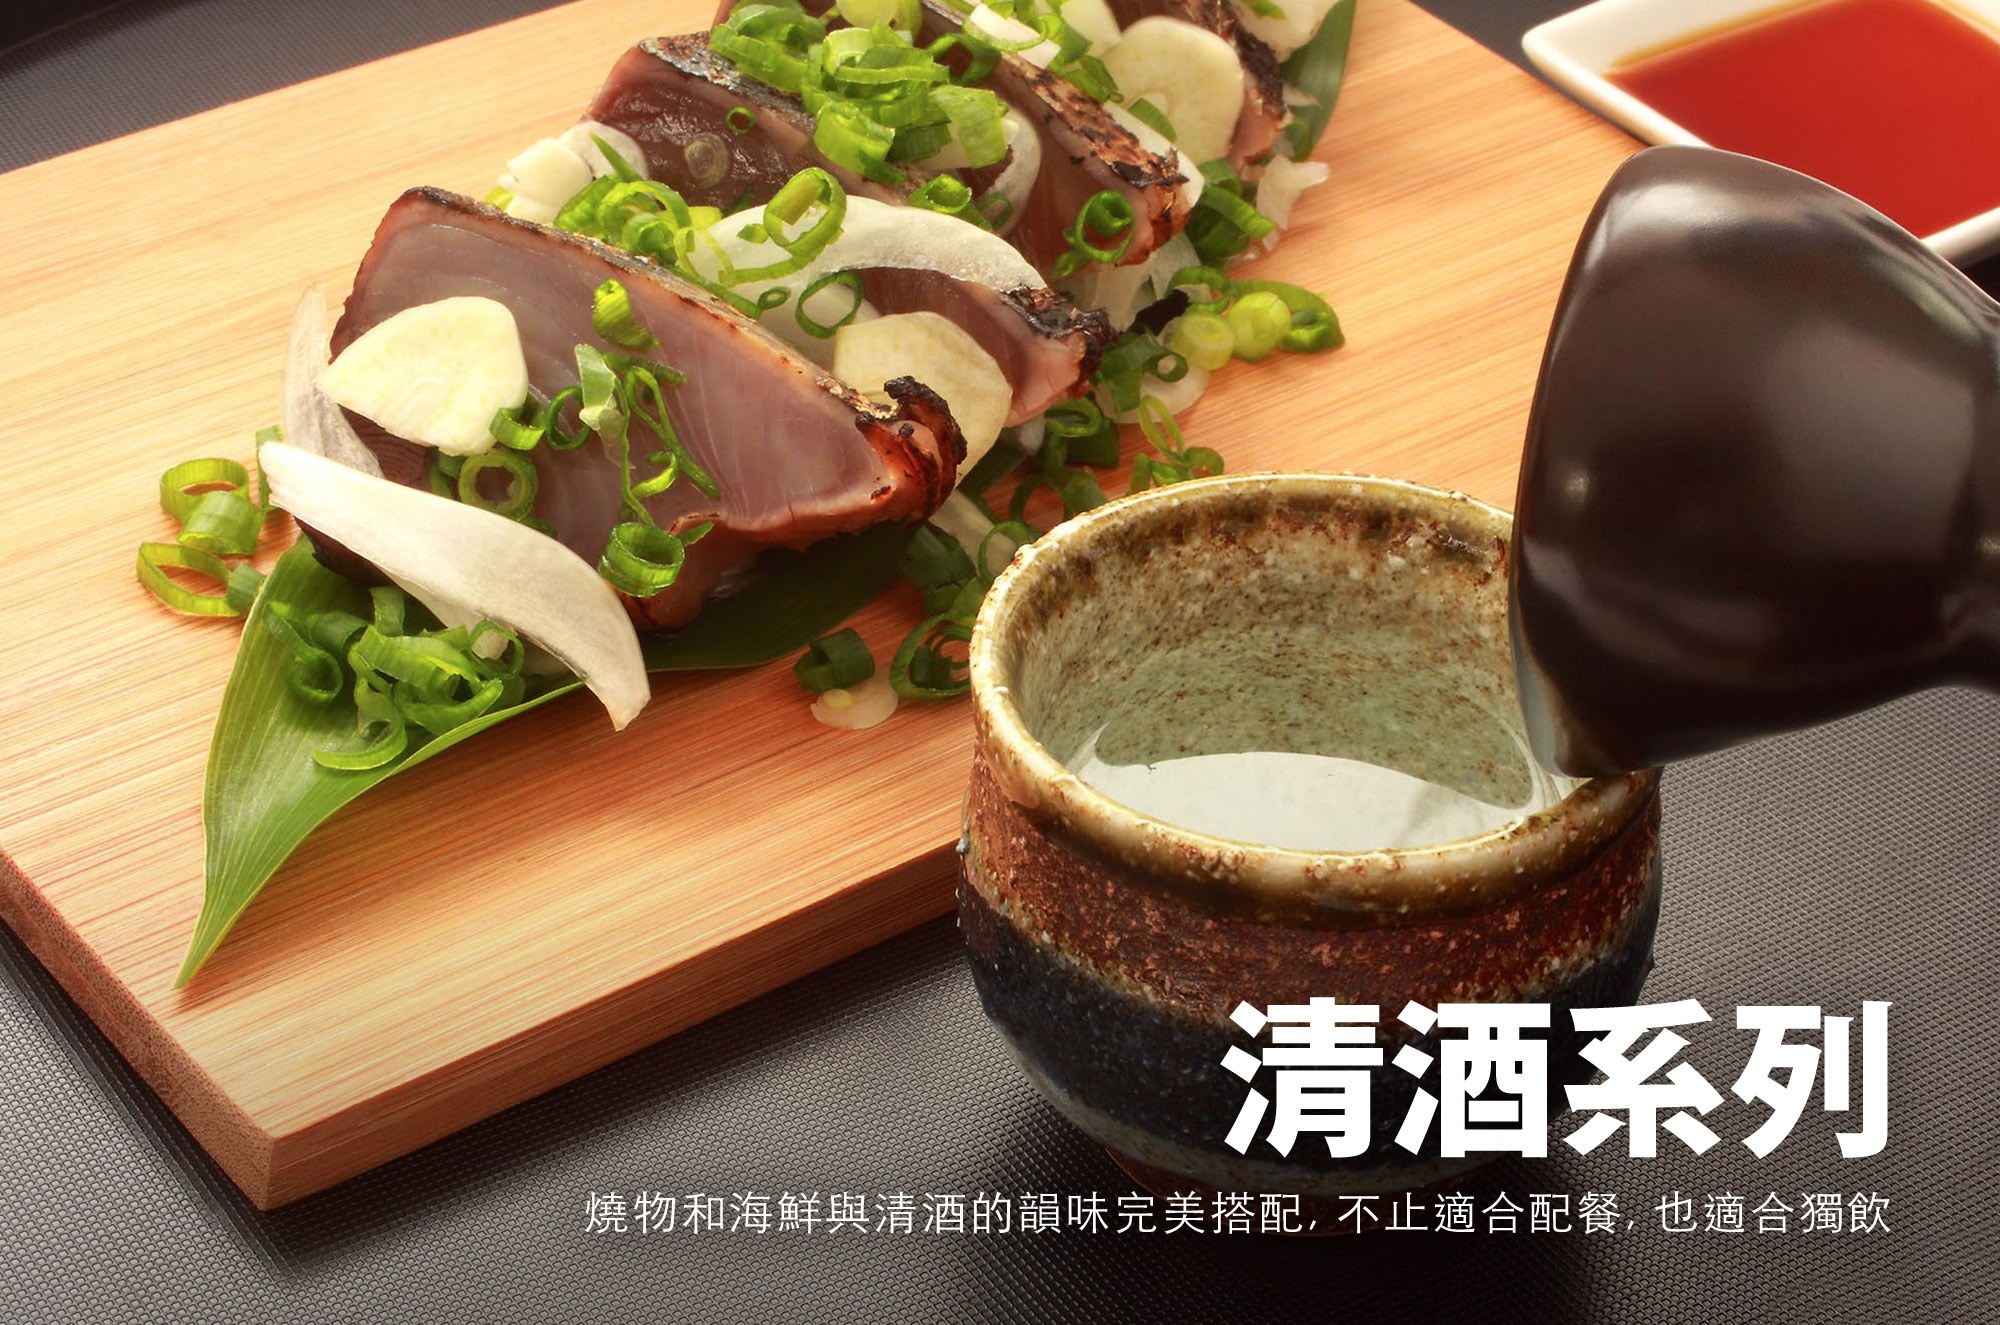 Recipes-2-清酒.jpg